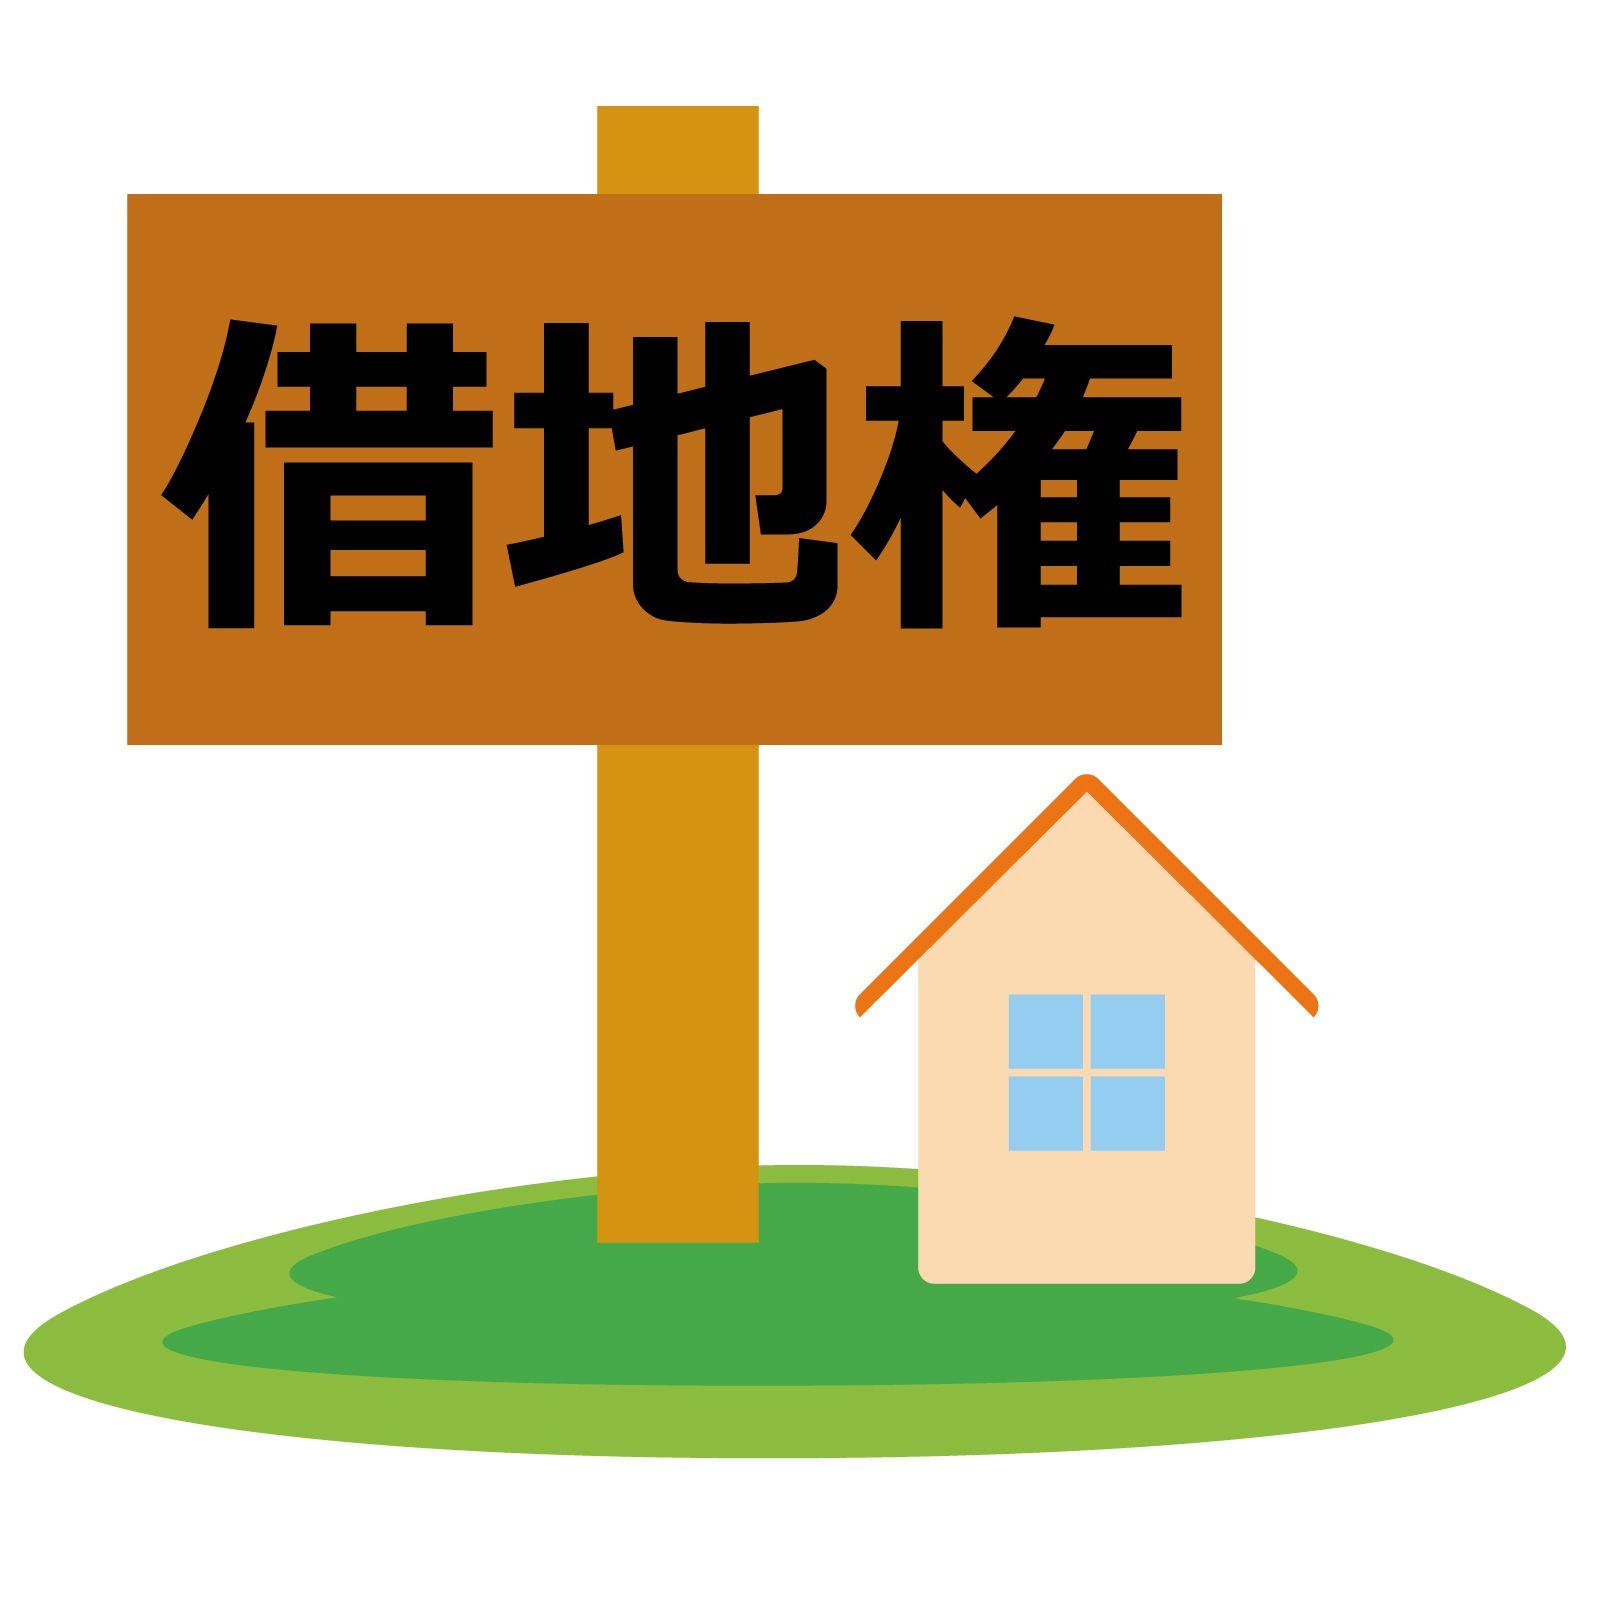 借地権売却の税金